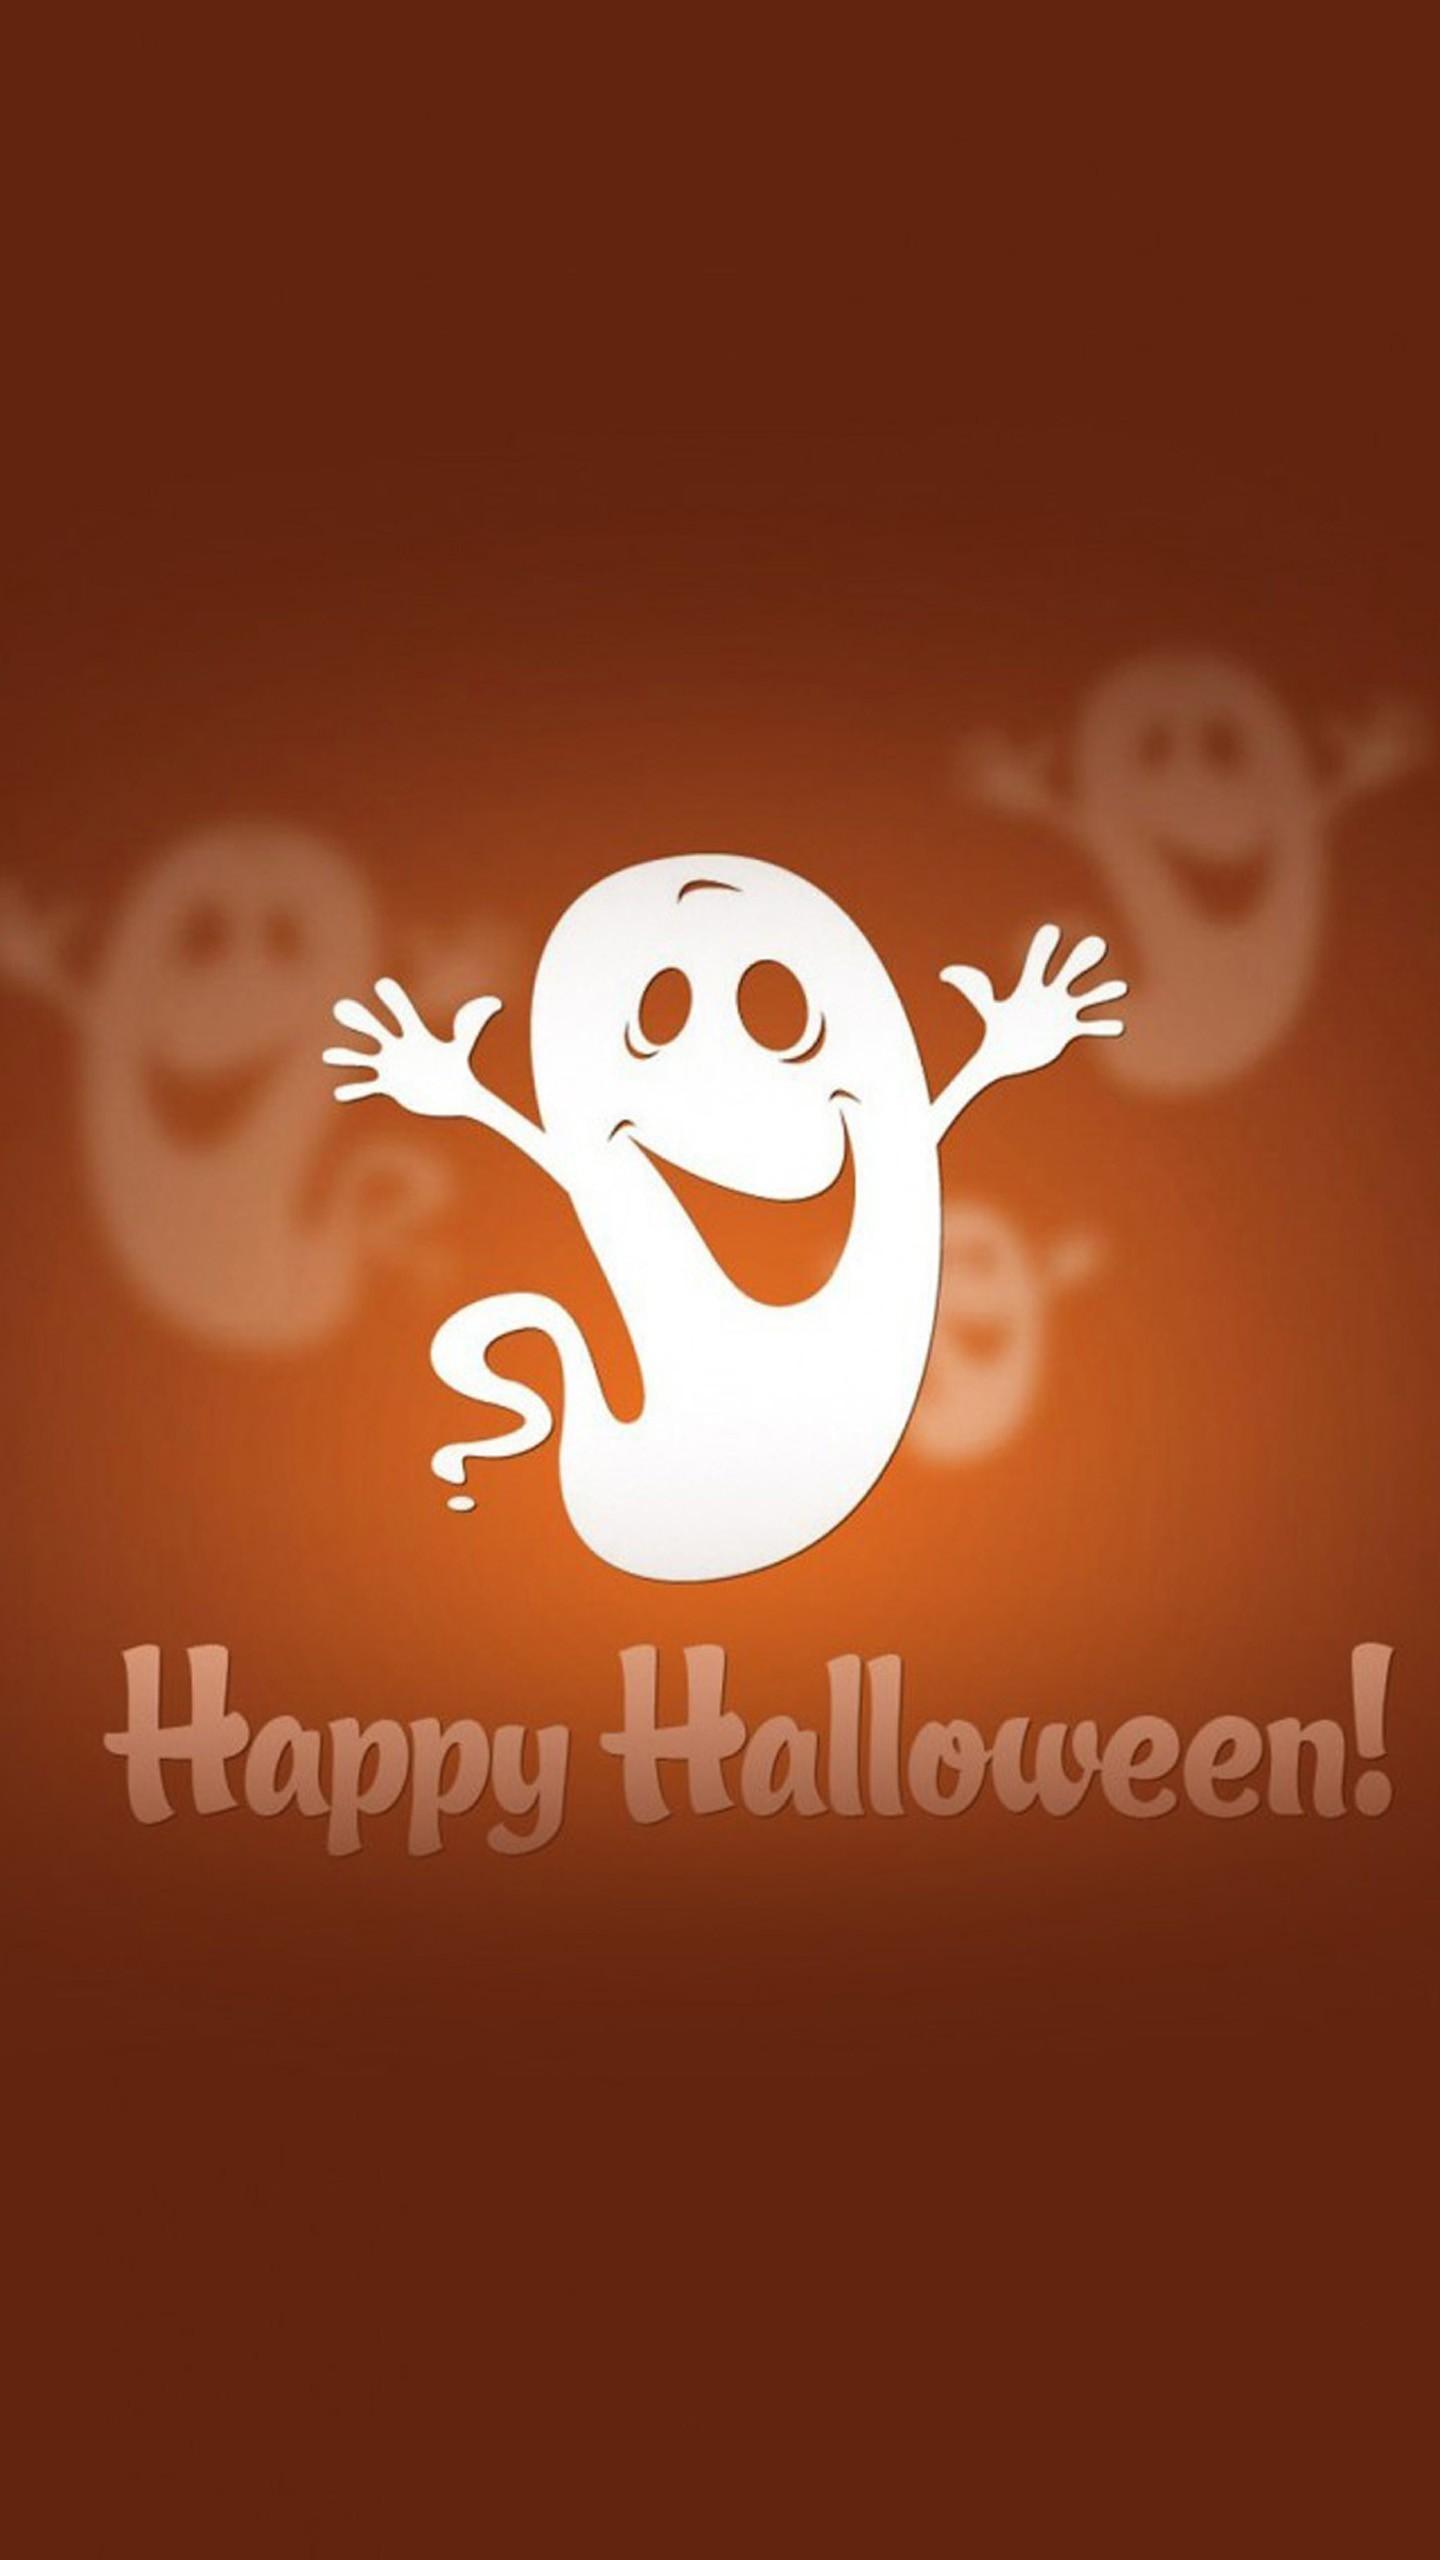 Wonderful Wallpaper Halloween Galaxy S6 - happy-halloween-wallpaper-wallpaper-background-1440x2560  Pictures_569142.jpg